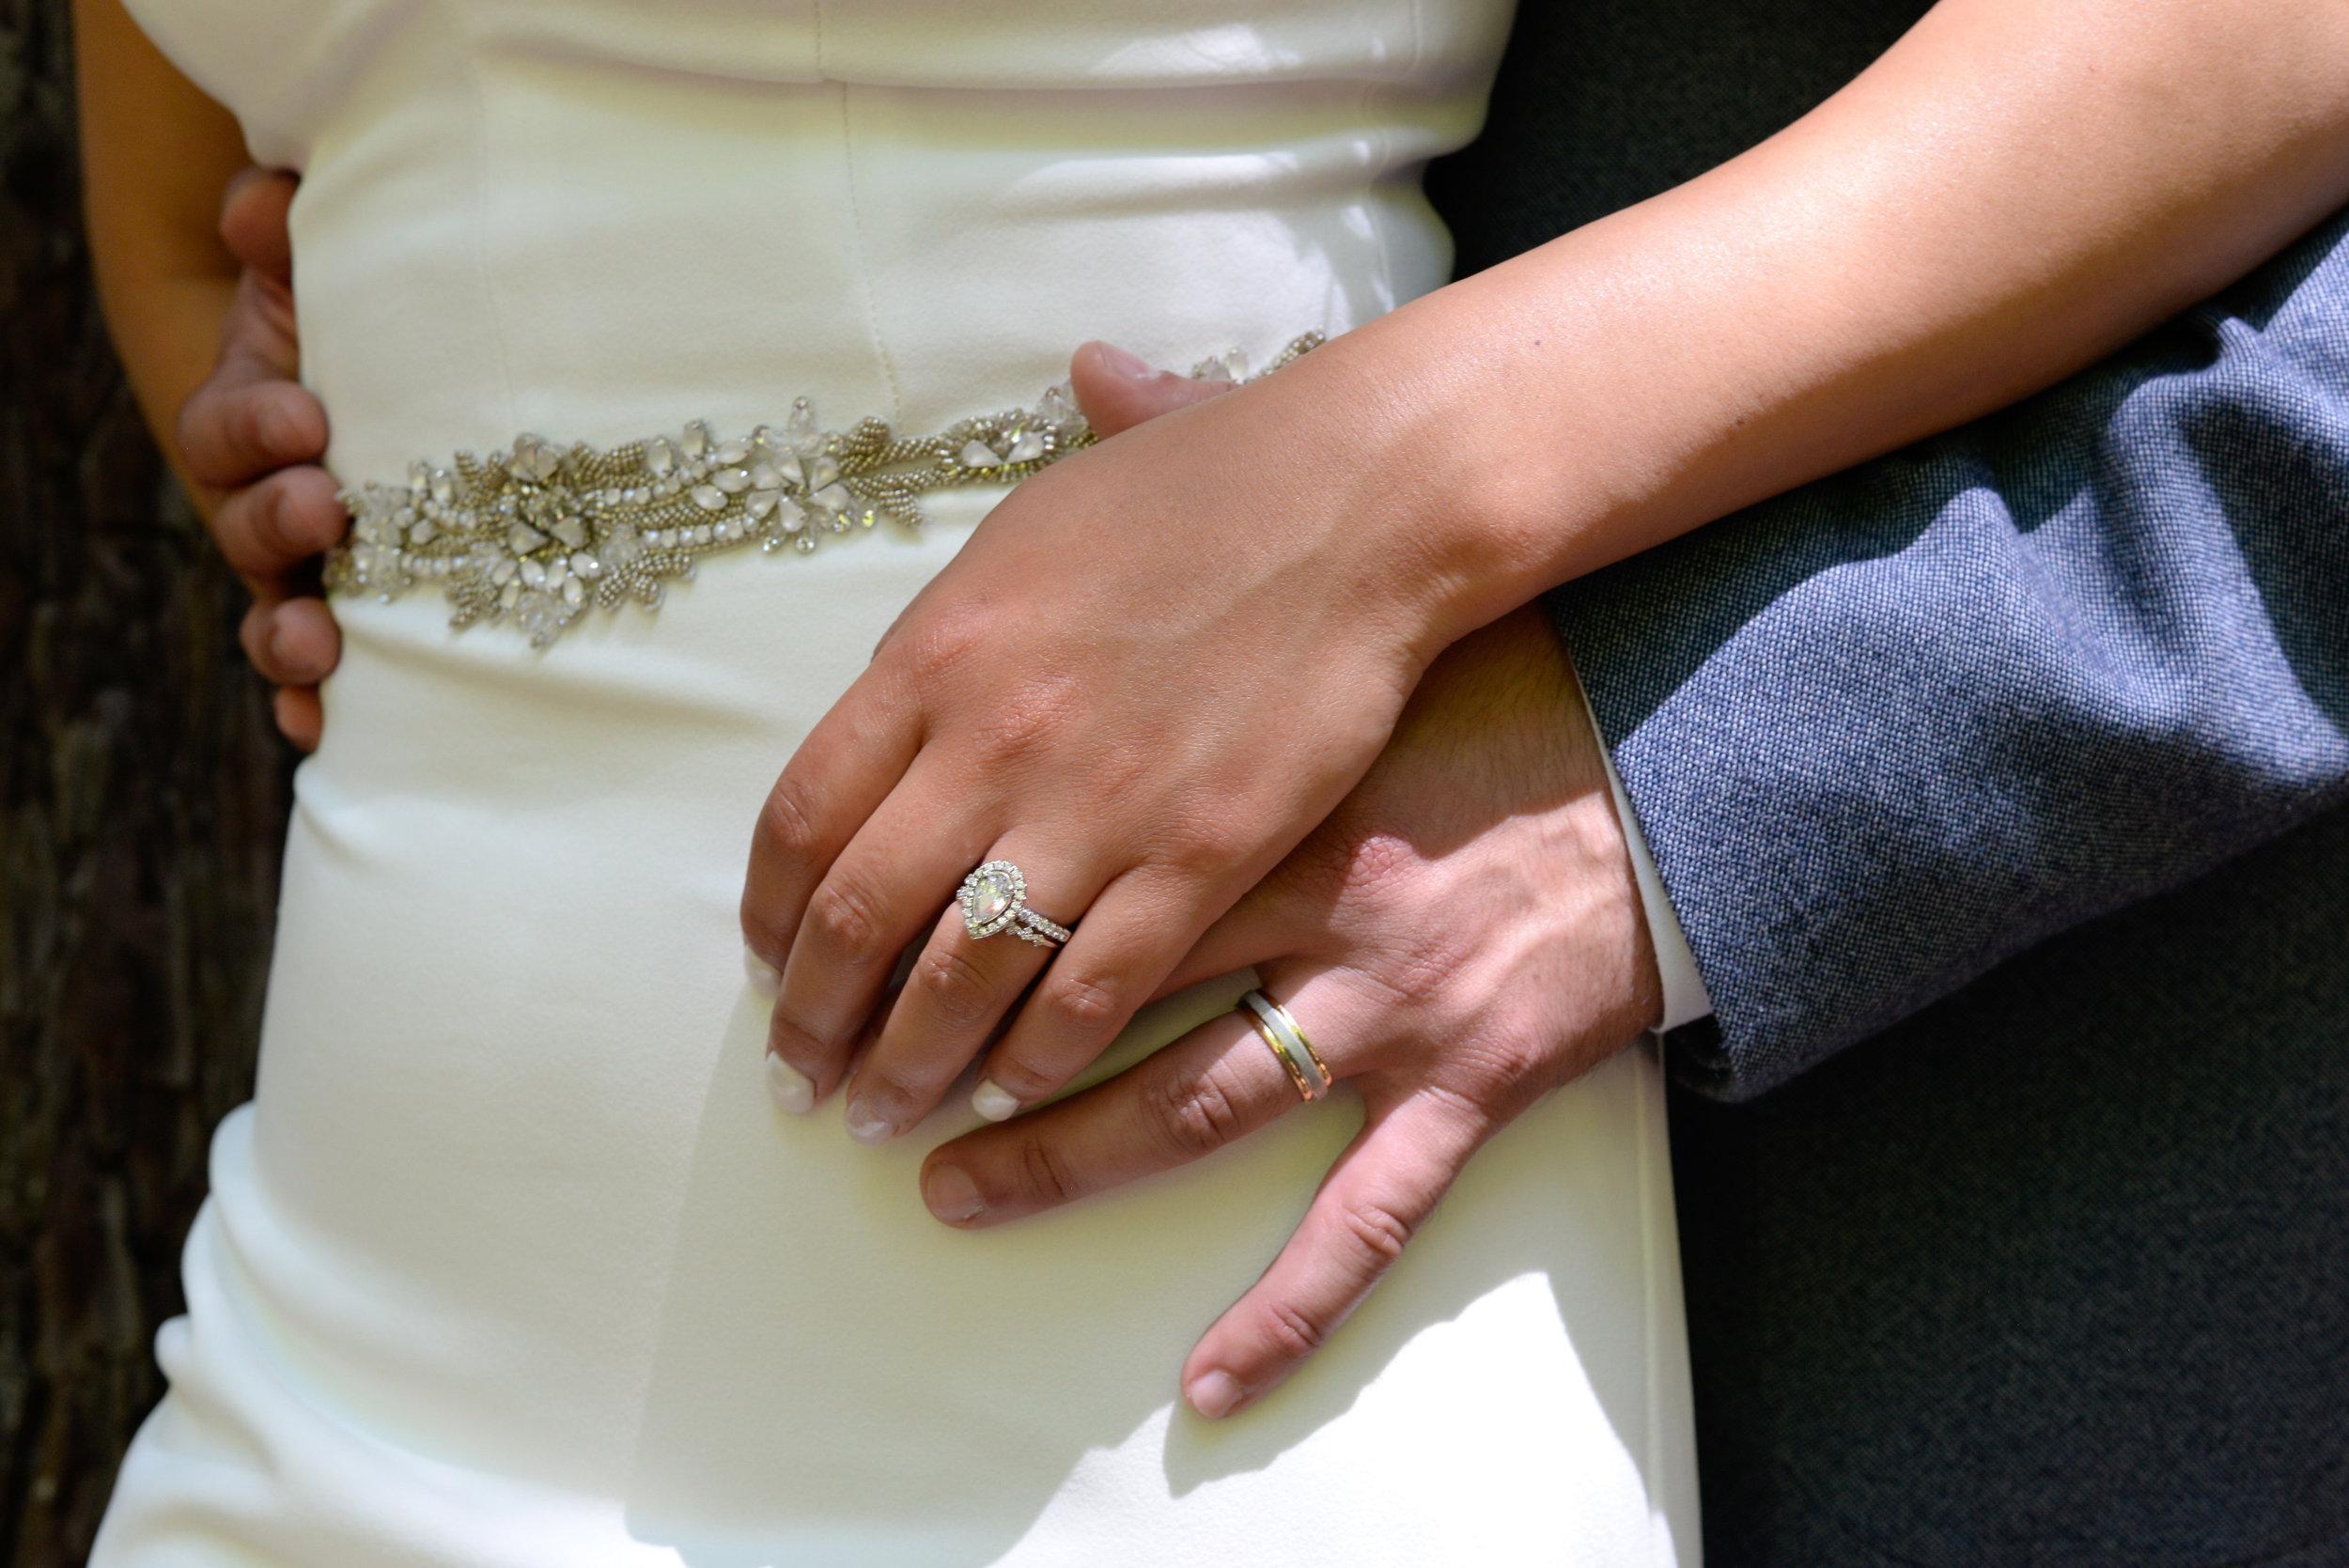 H_R Wedding (70 of 73).jpg